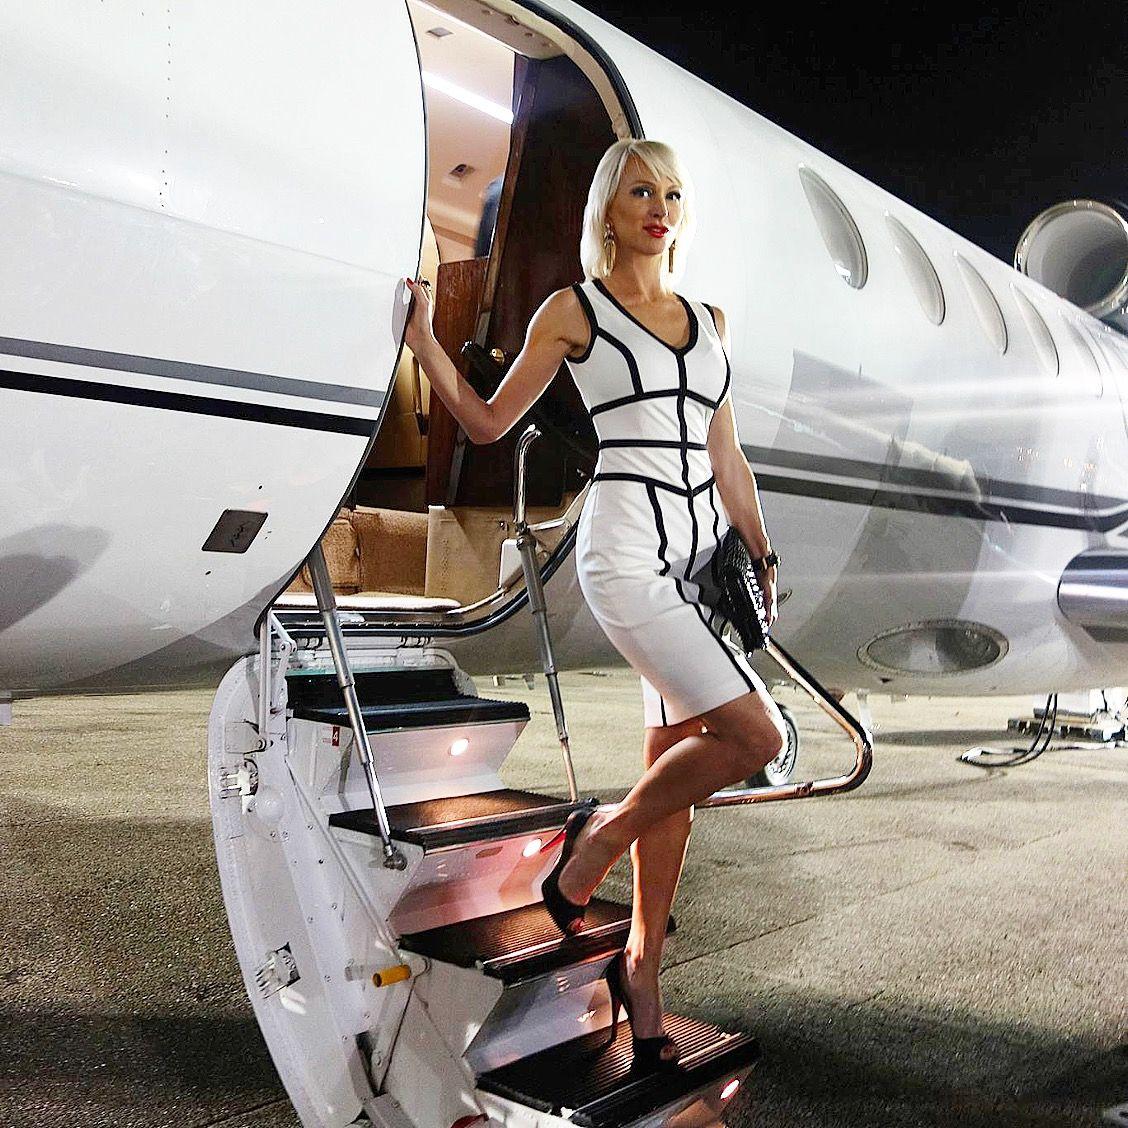 Pin by Malinka Max on Jet Set | Travel around the world ...